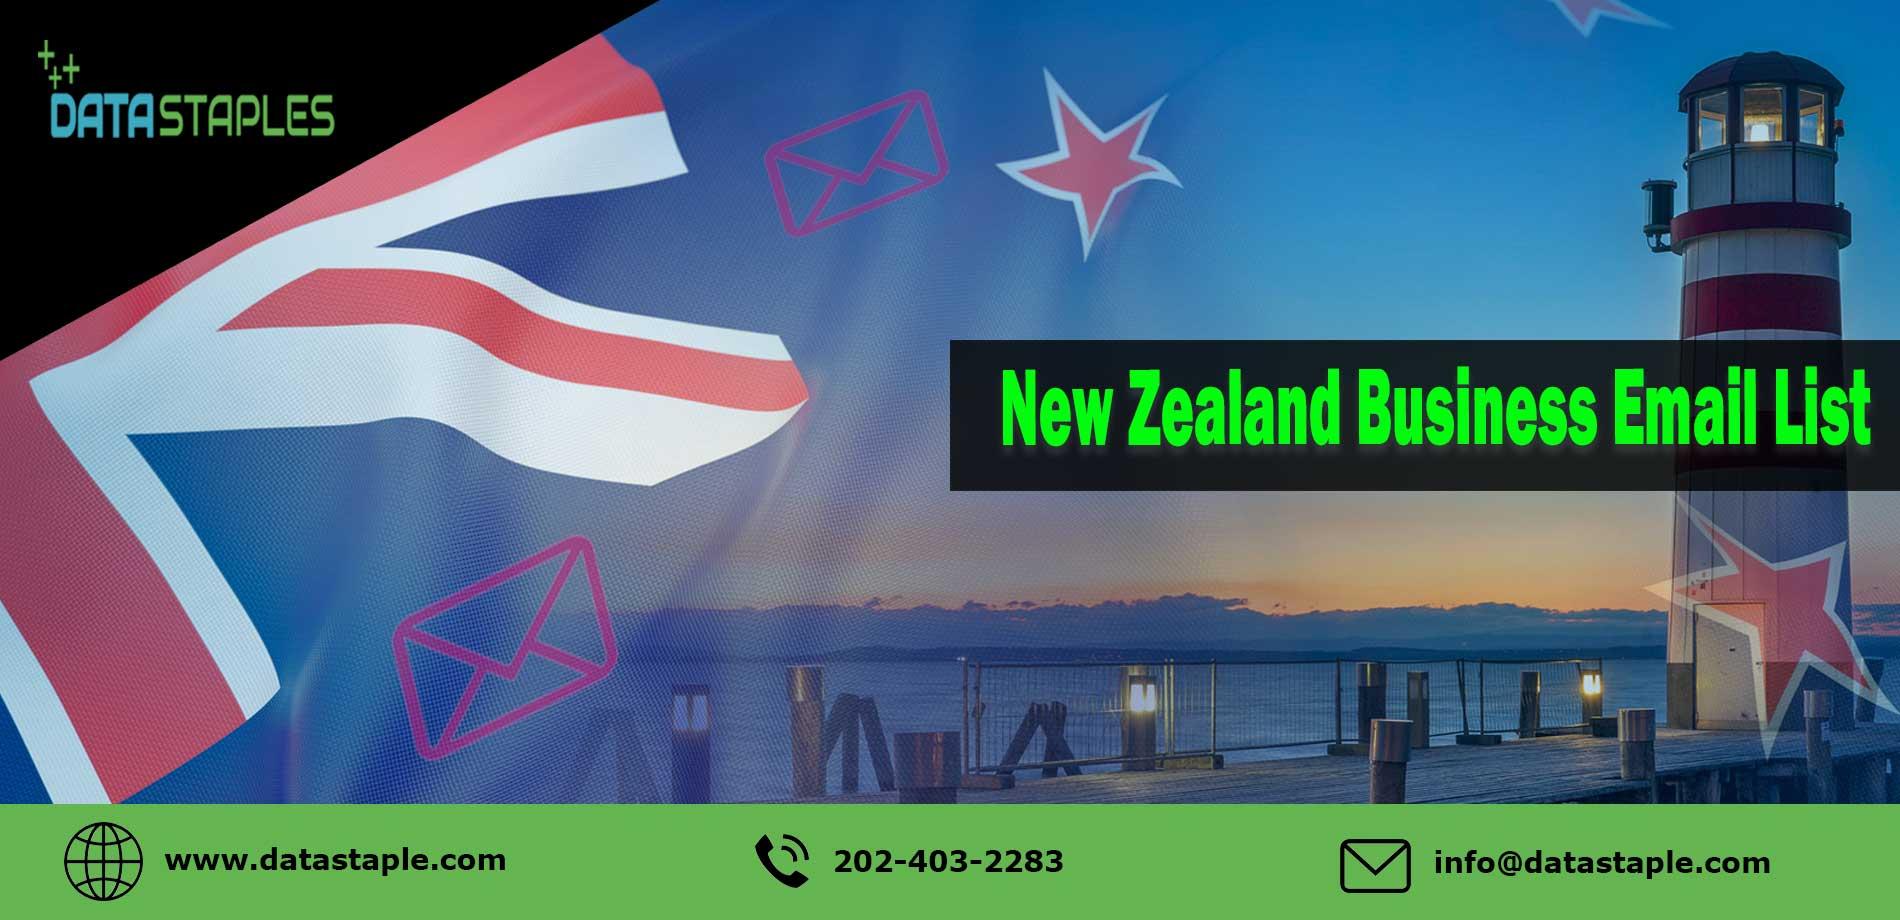 New Zealand Business Email List   DataStaples